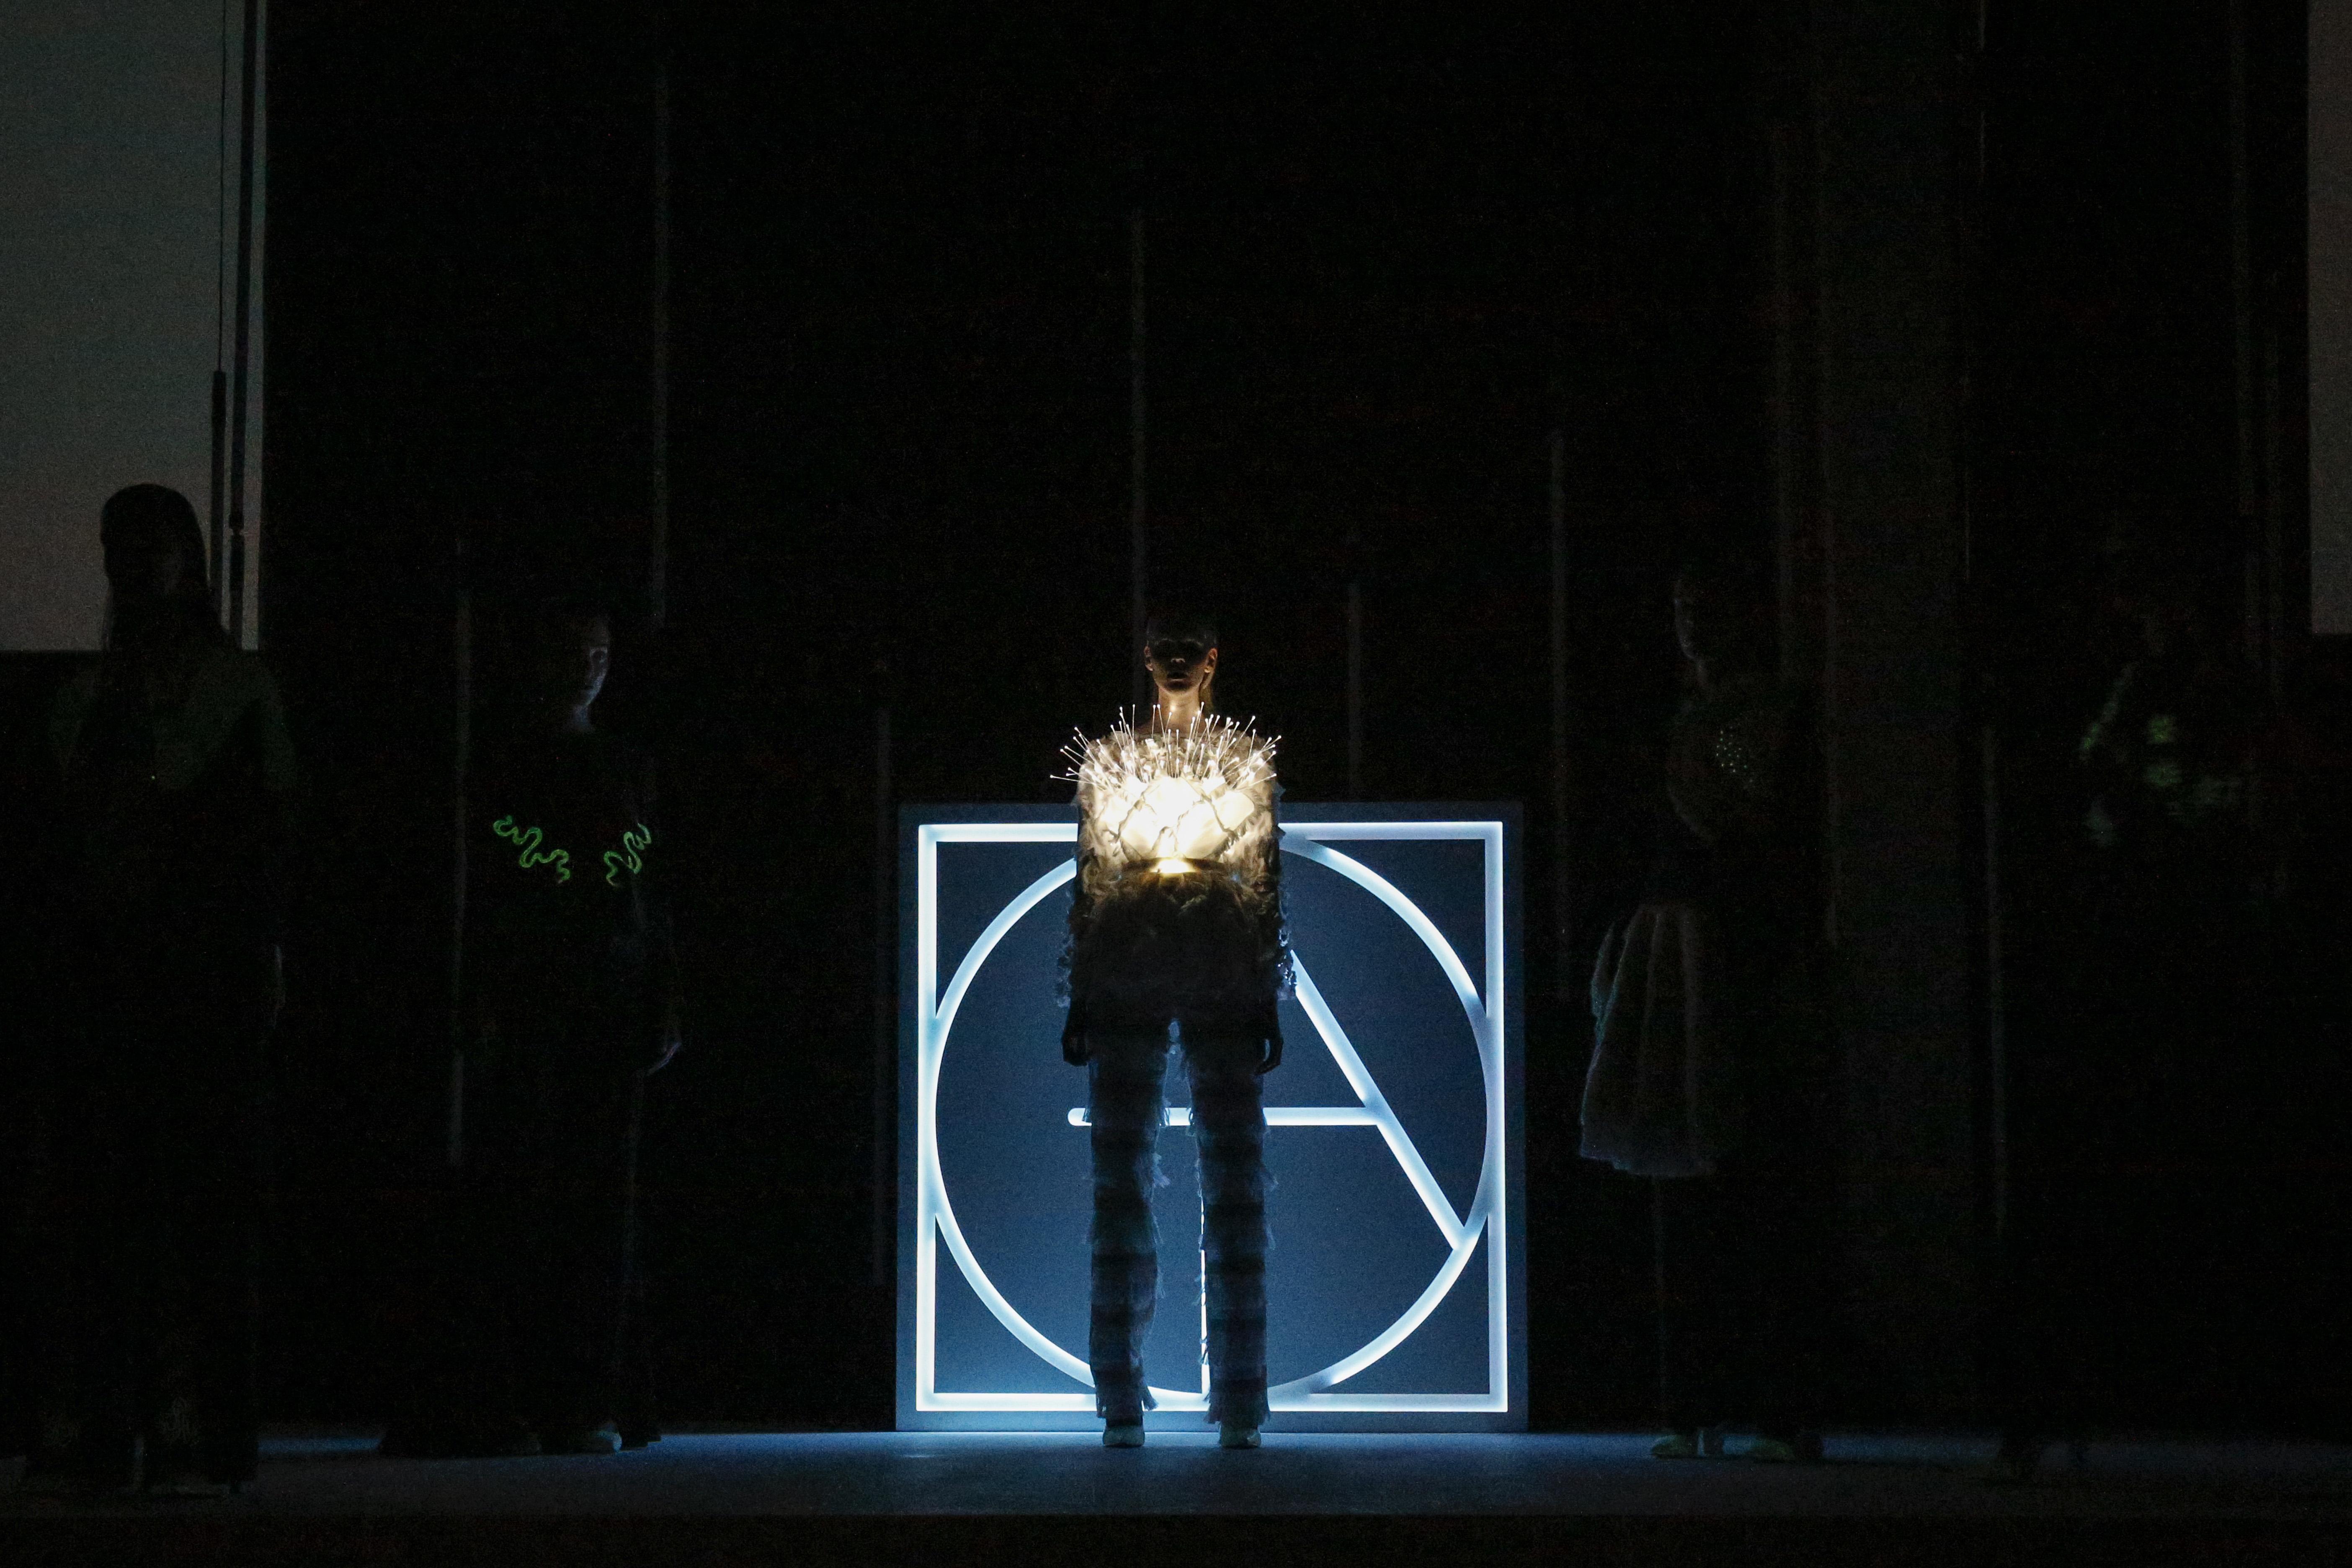 Anbasja Blanken's glow-in-the-dark jeans with ITV Denim.